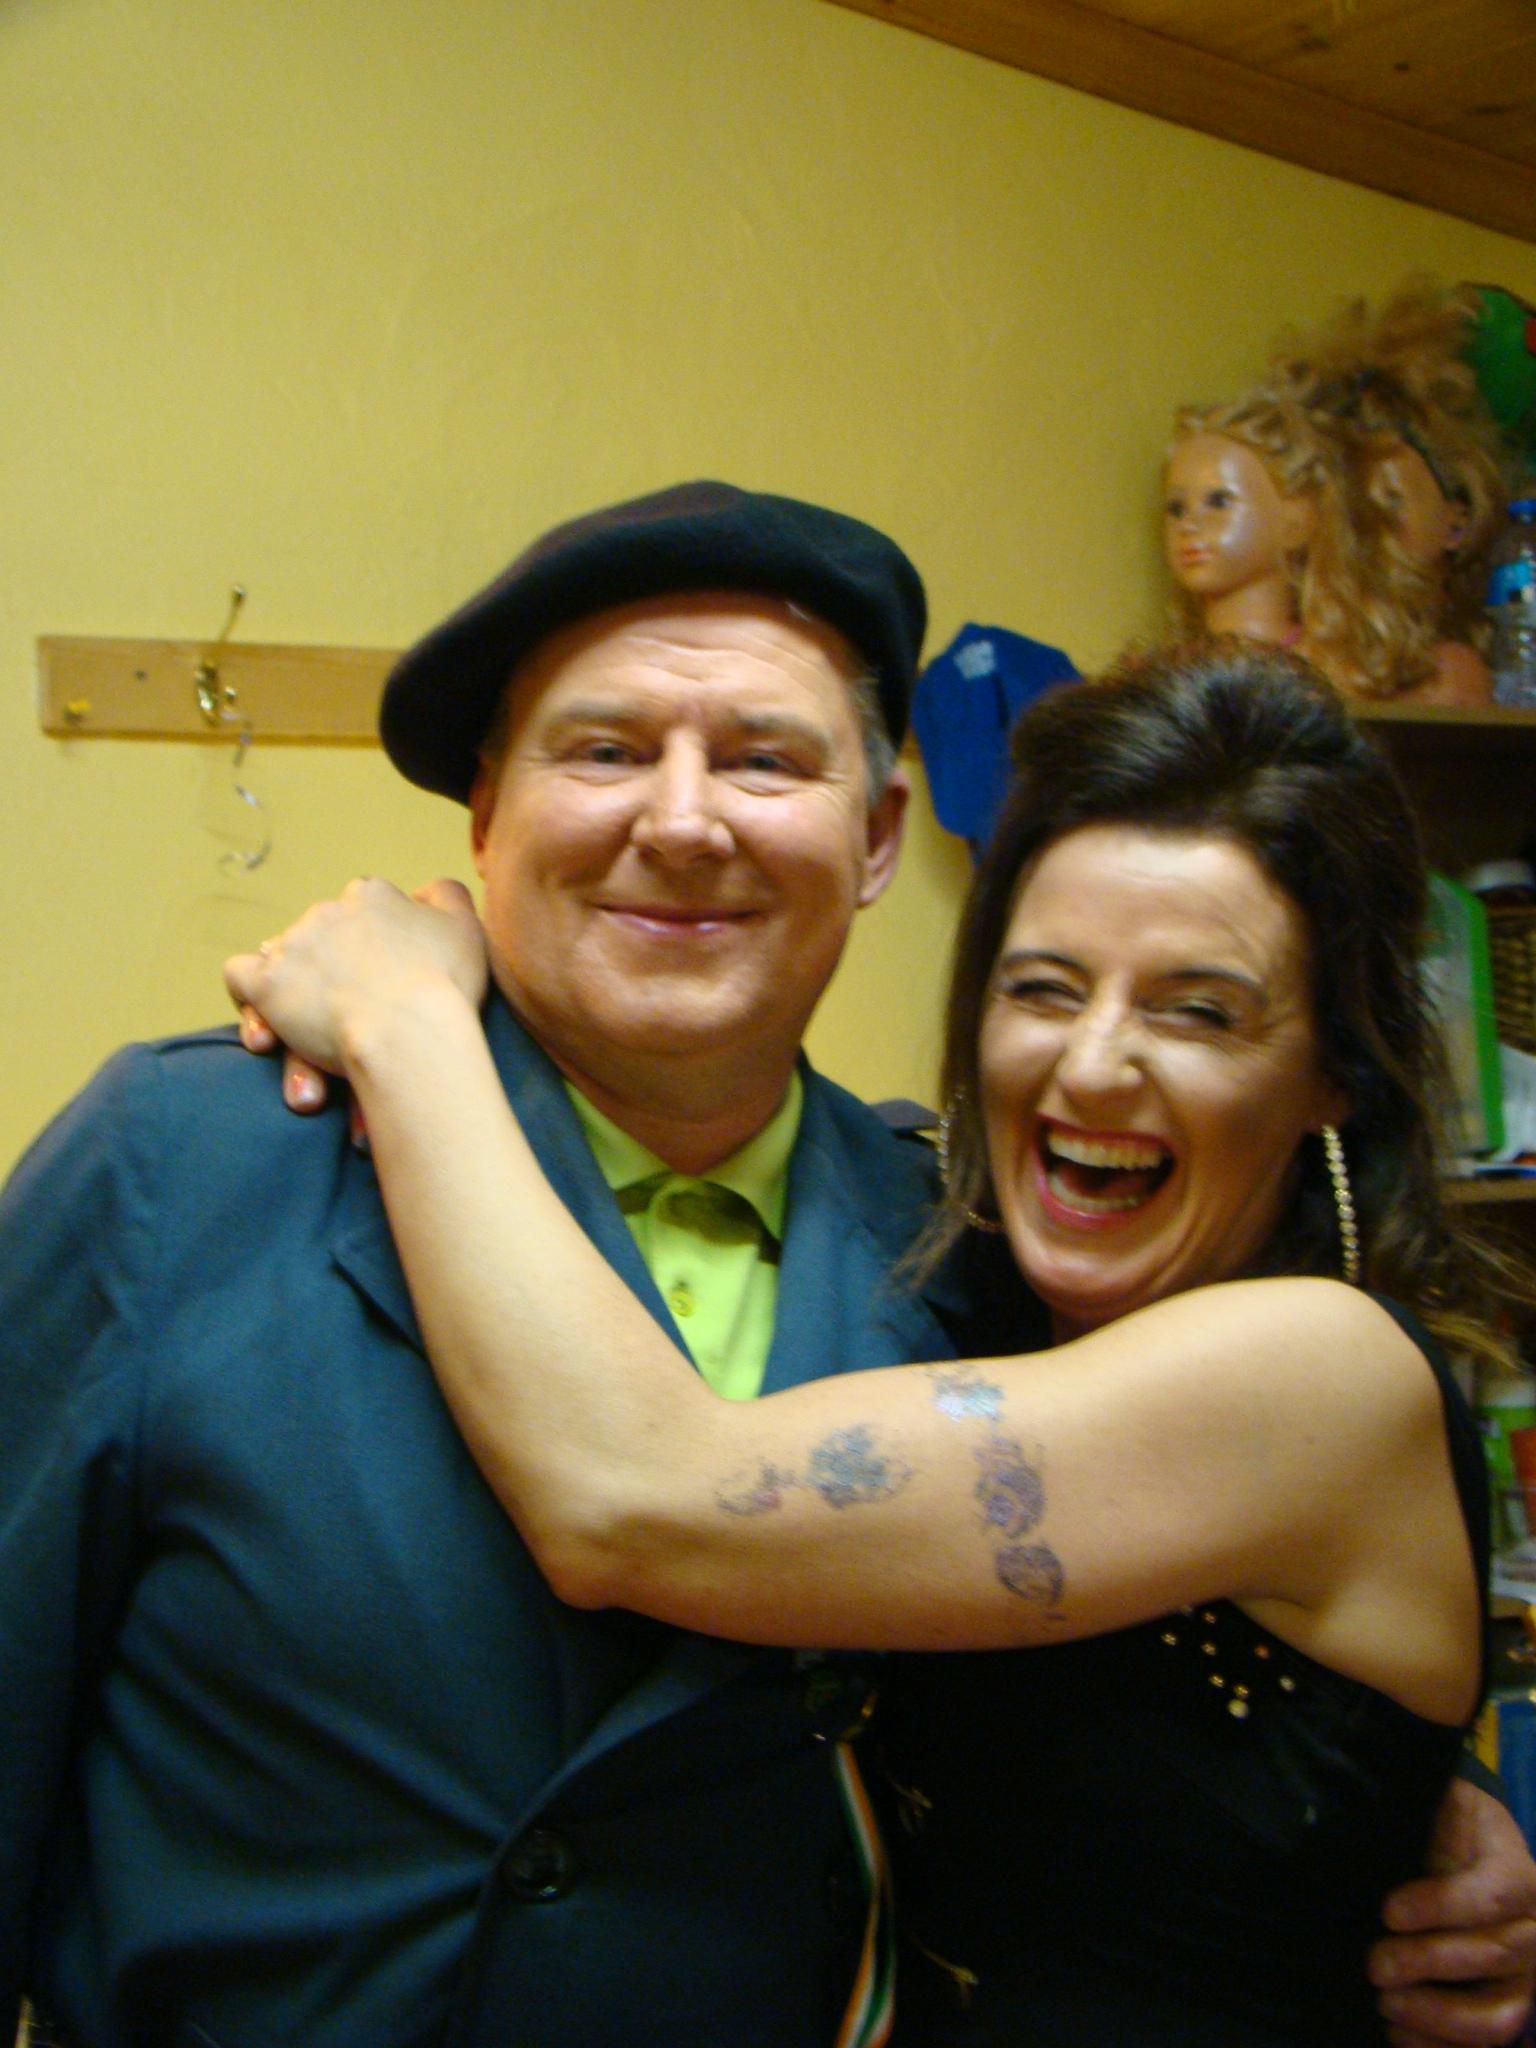 JOhn English & Marylee